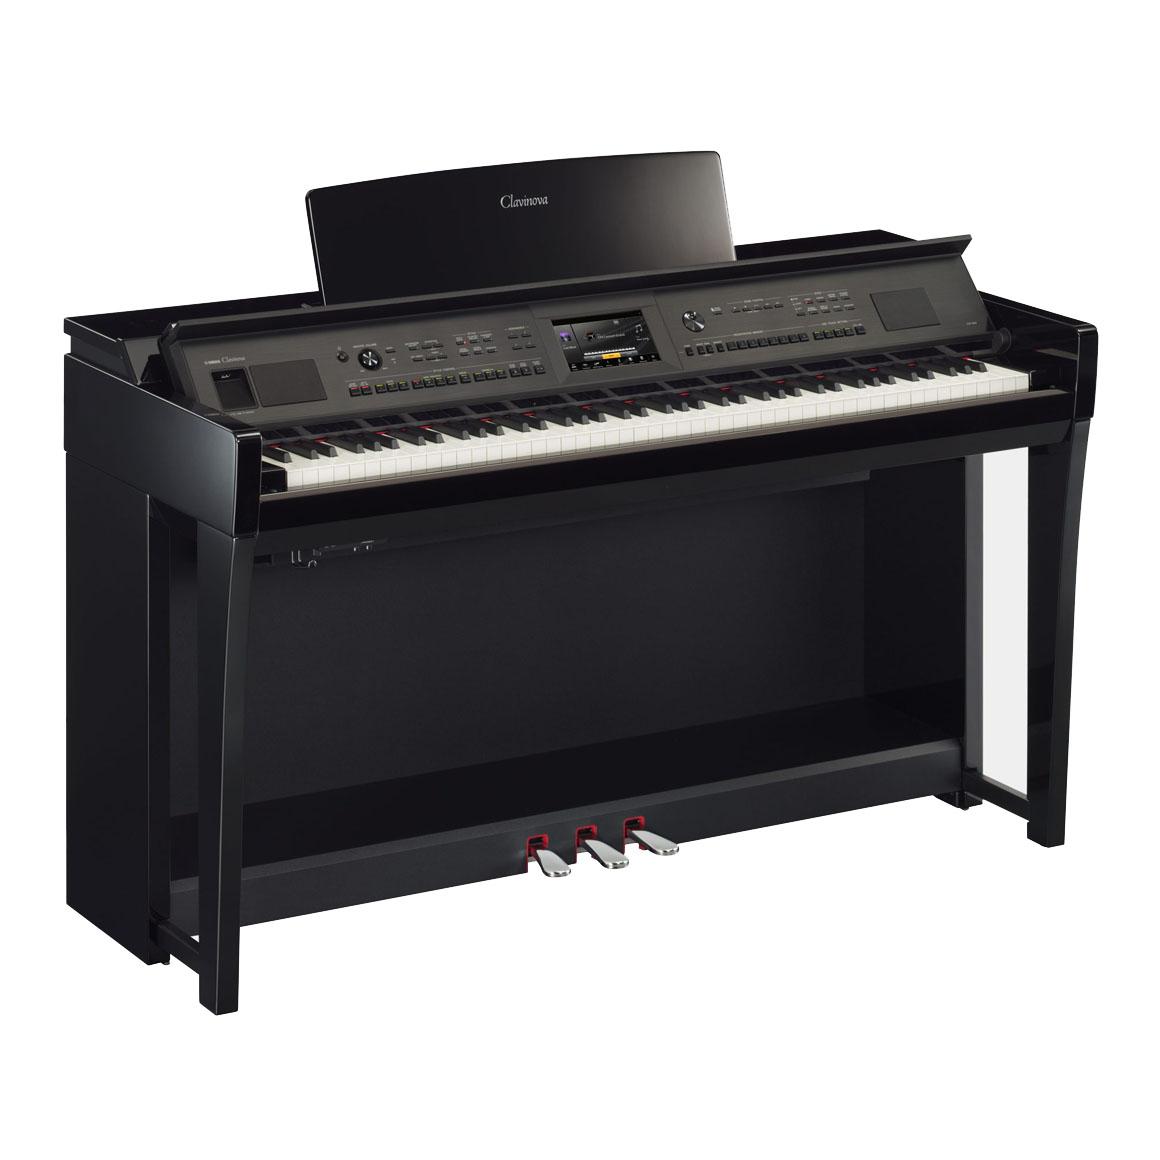 Yamaha Cvp805 Clavinova Cvp 800 Series Digital Piano   Tmw for Yamaha Singapore Calendar